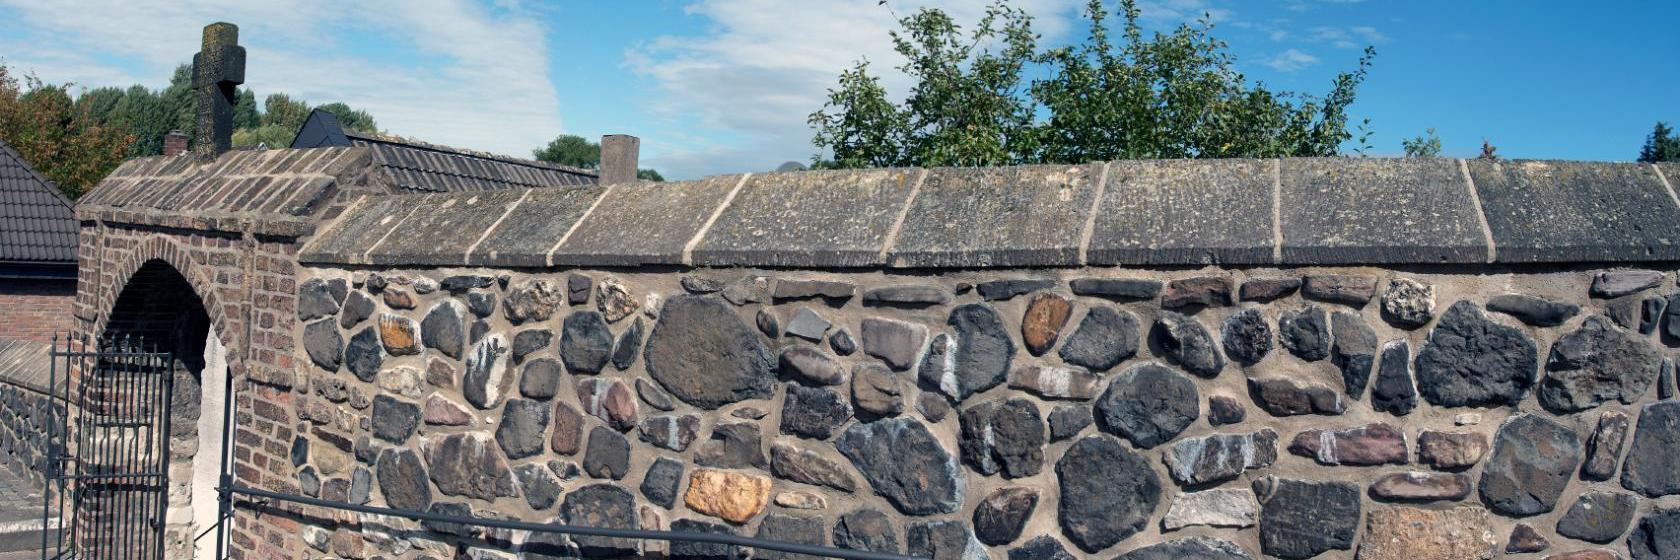 Long Weekend - Review of Camac Valley Tourist - TripAdvisor